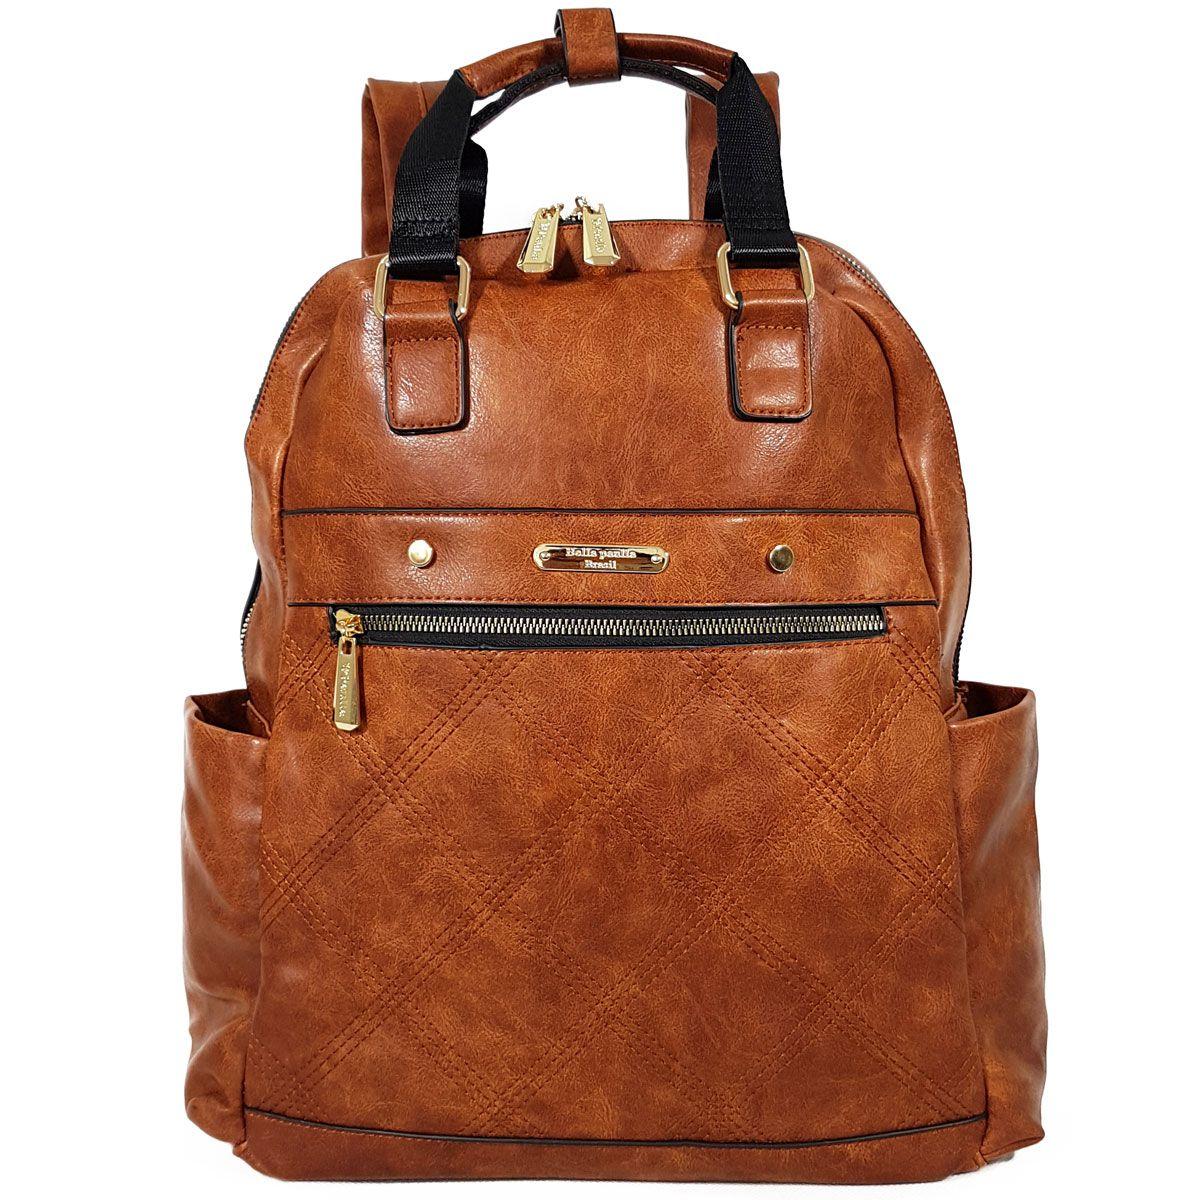 b4622ac57f BOLSA MOCHILA MODERNA BELLA PAULA - BP-7381 - Classe Bag